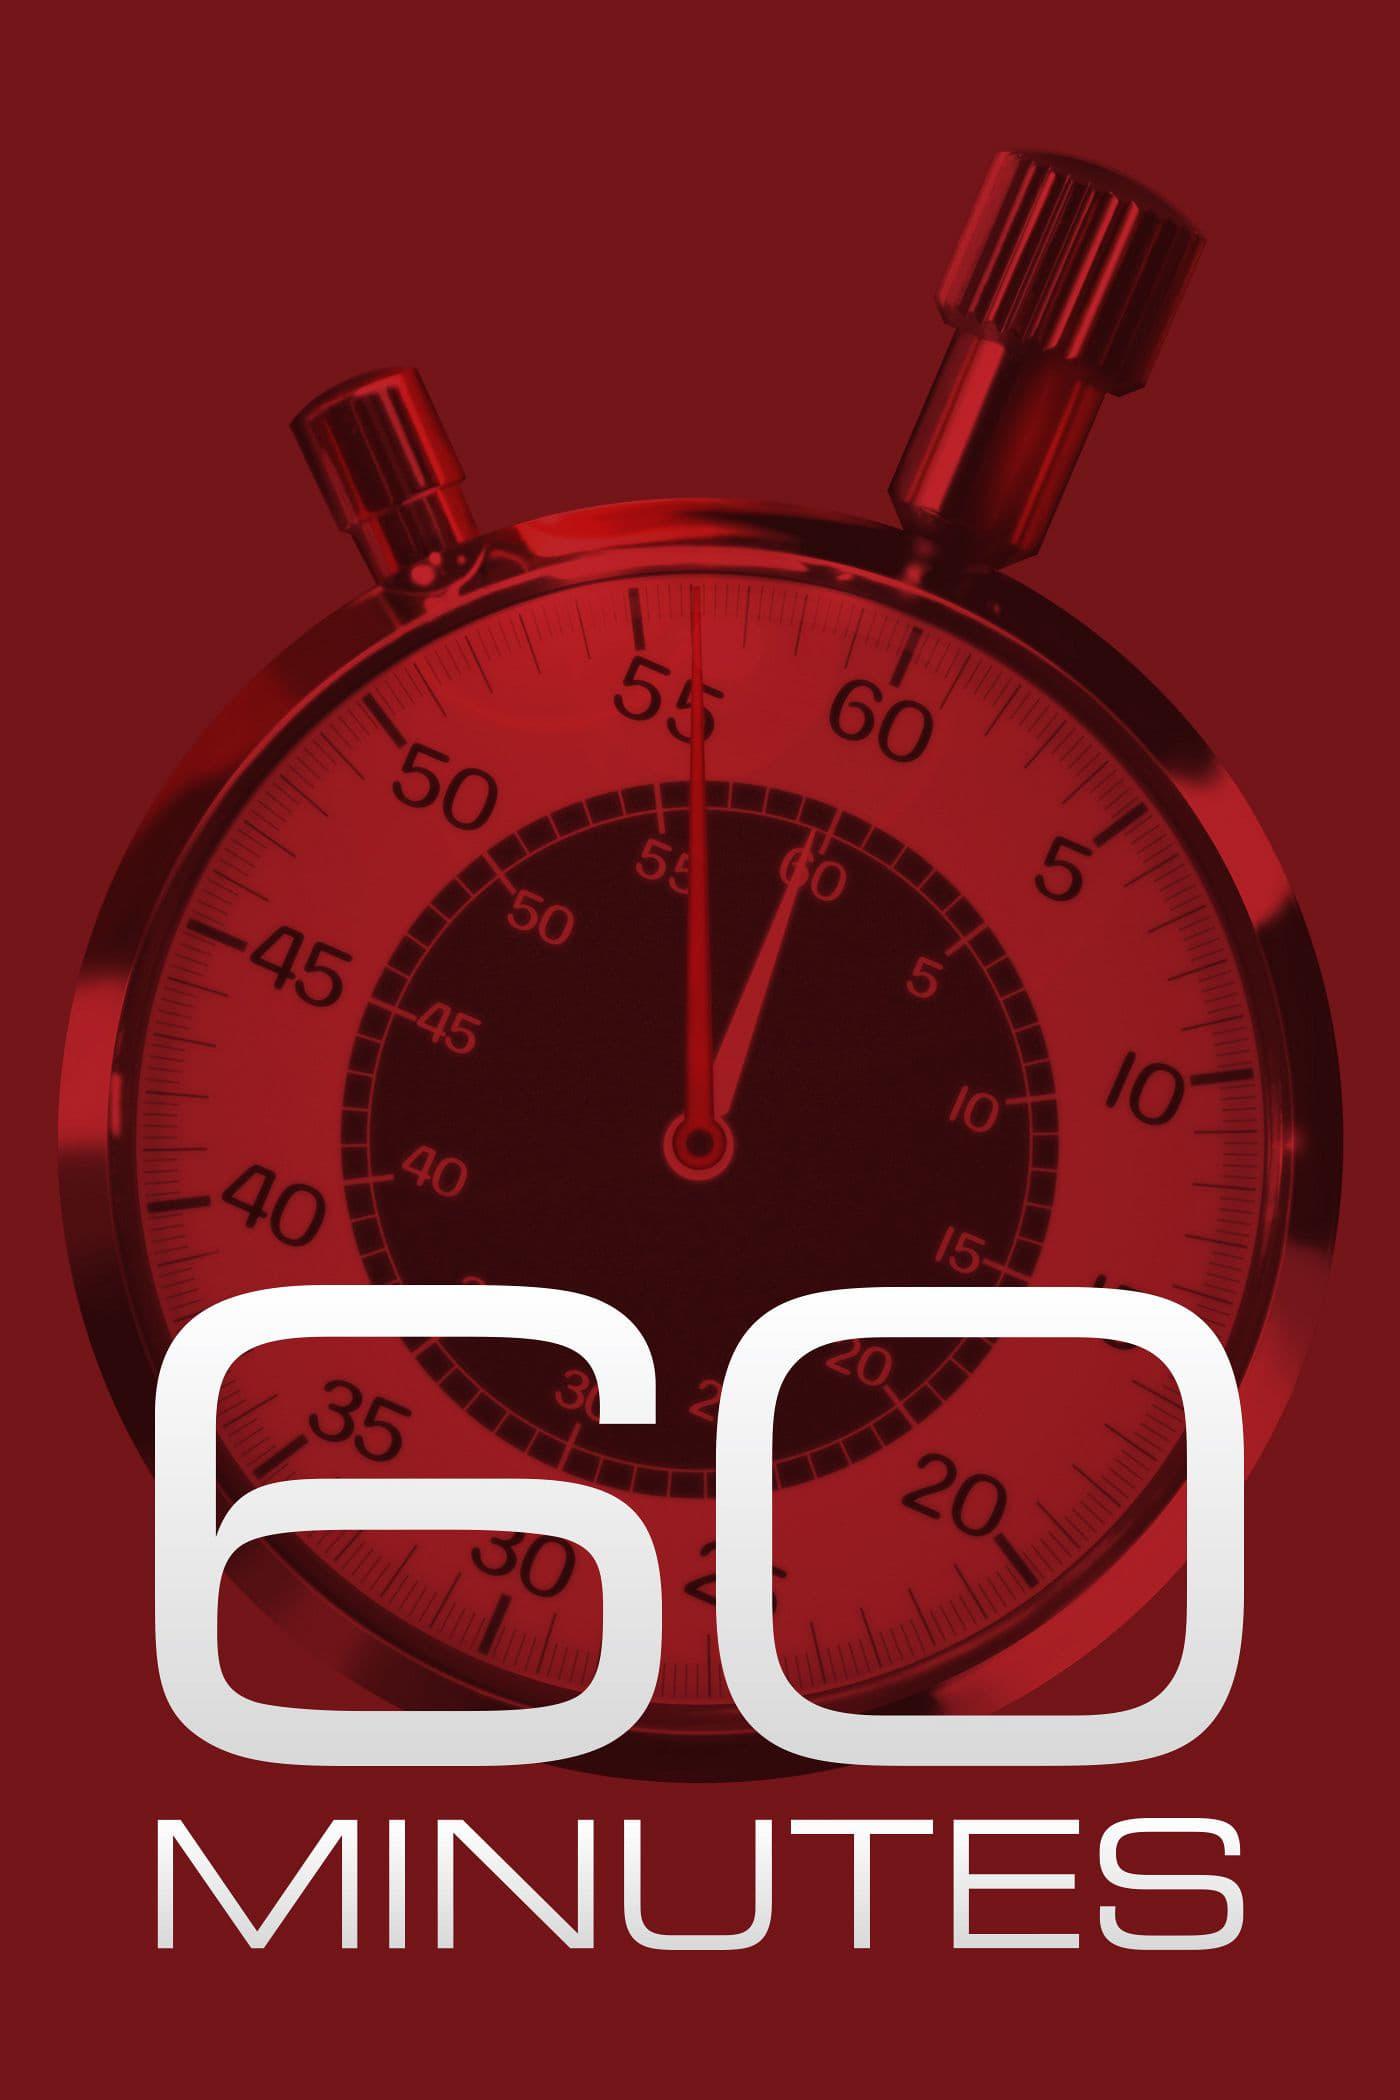 60 Minutes (1968)